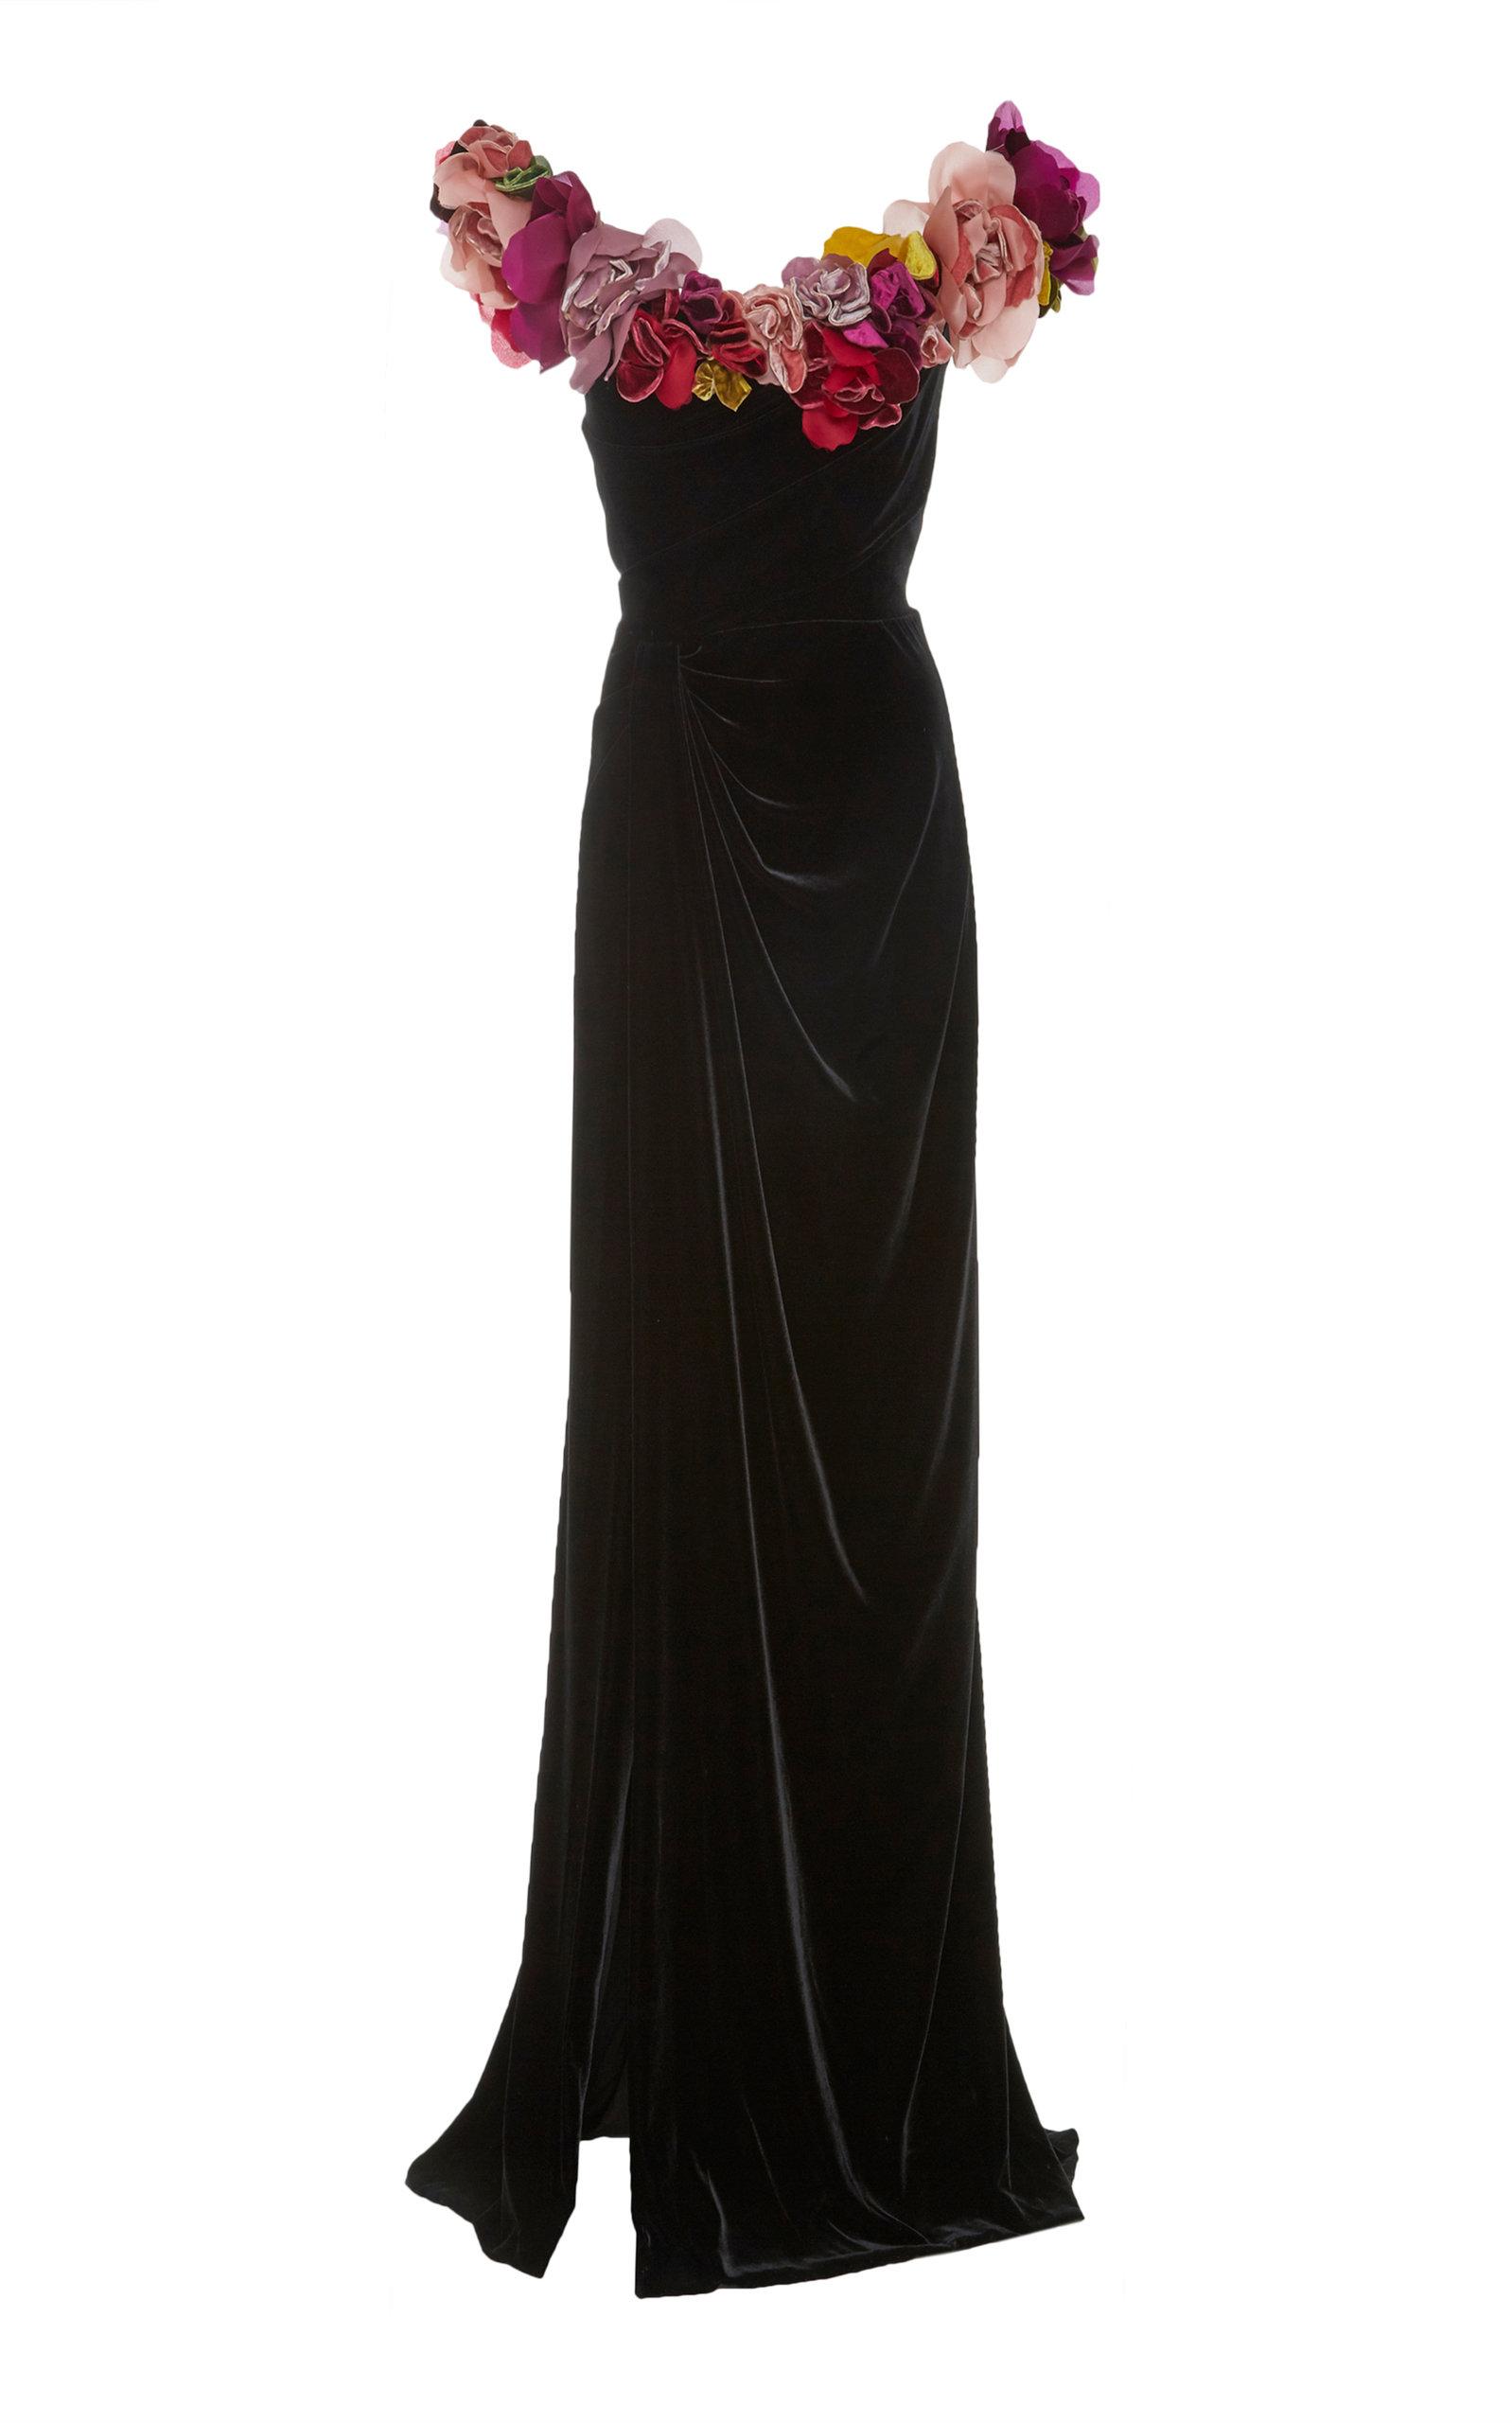 6db67f51 MarchesaFloral-Appliquéd Off-The-Shoulder Velvet Gown. CLOSE. Loading